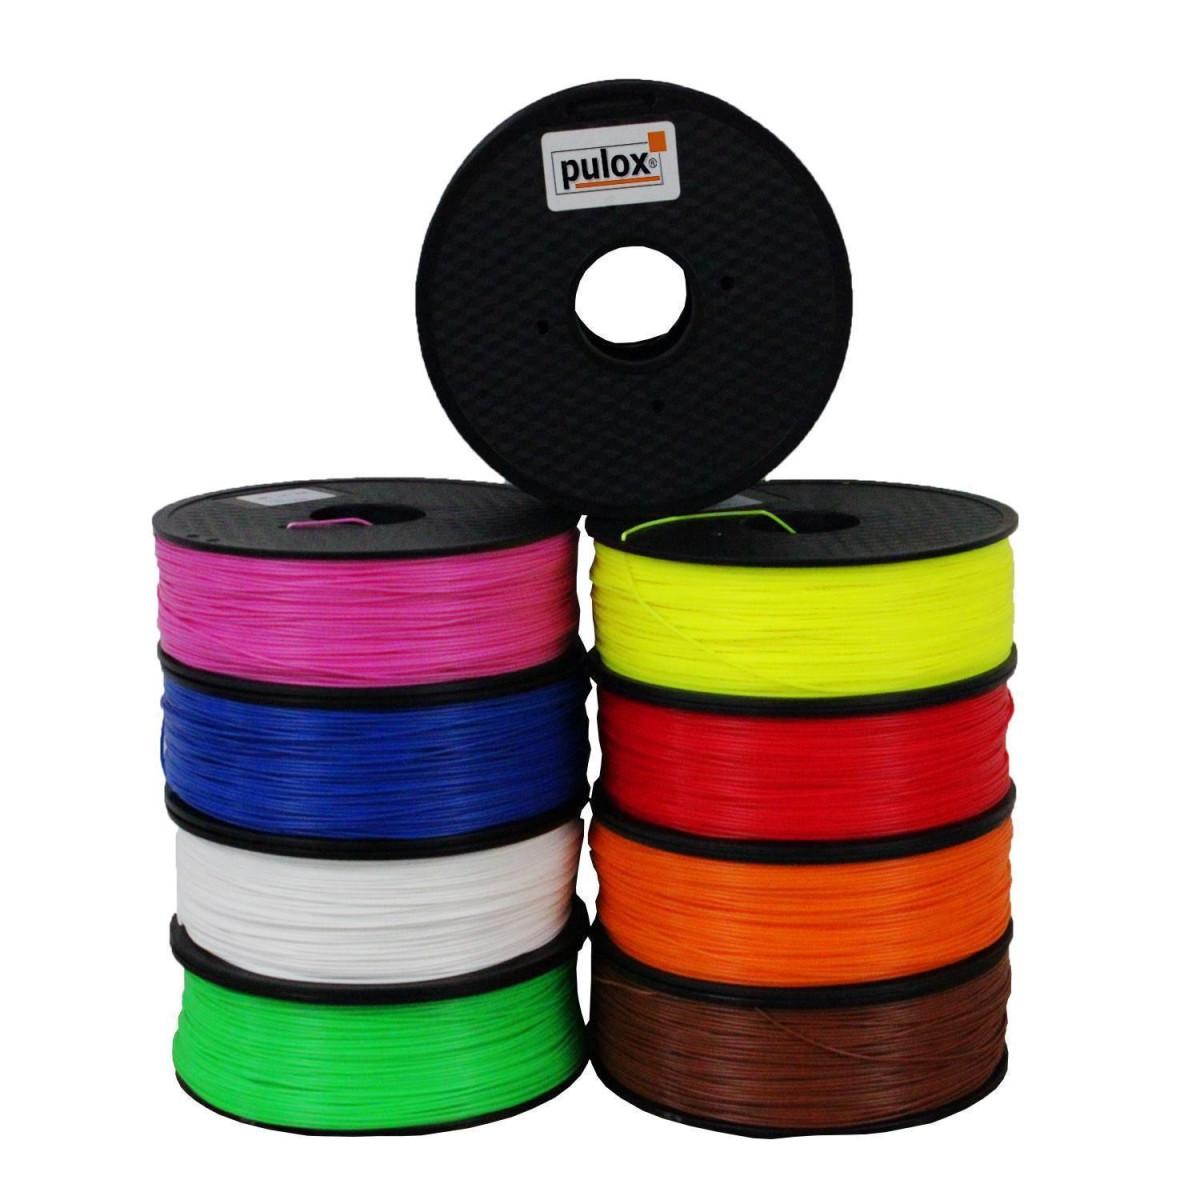 pulox 3d drucker abs filament rolle 1kg pulsoximeter von pul. Black Bedroom Furniture Sets. Home Design Ideas